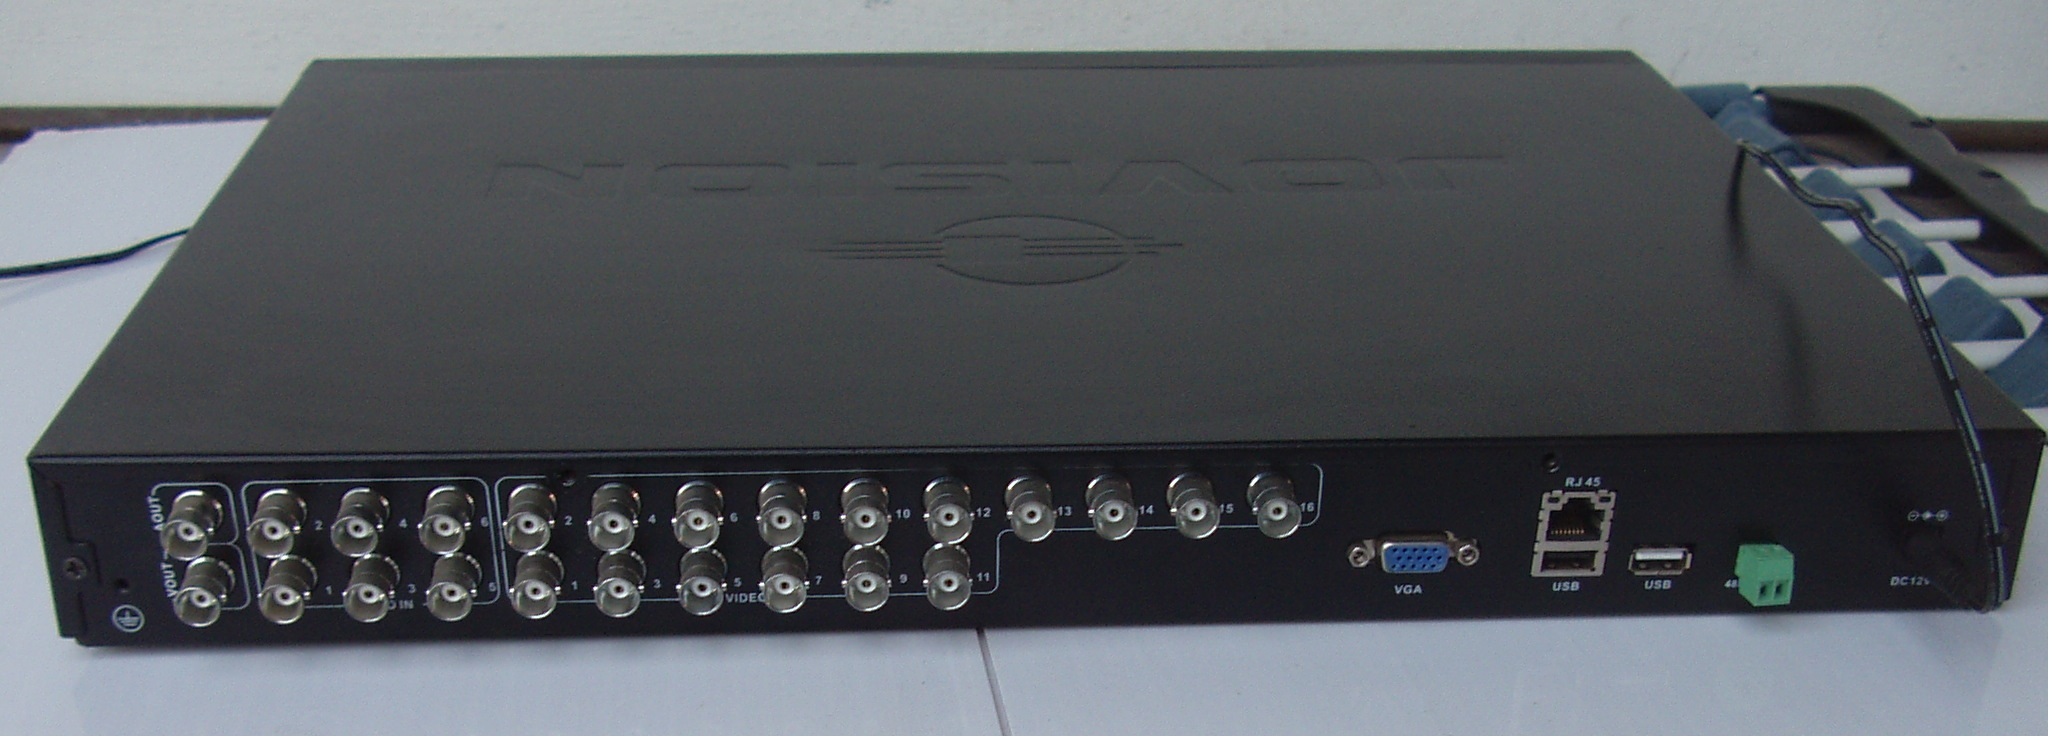 Jovision JVS-ND7016 - CCTV Consol /System